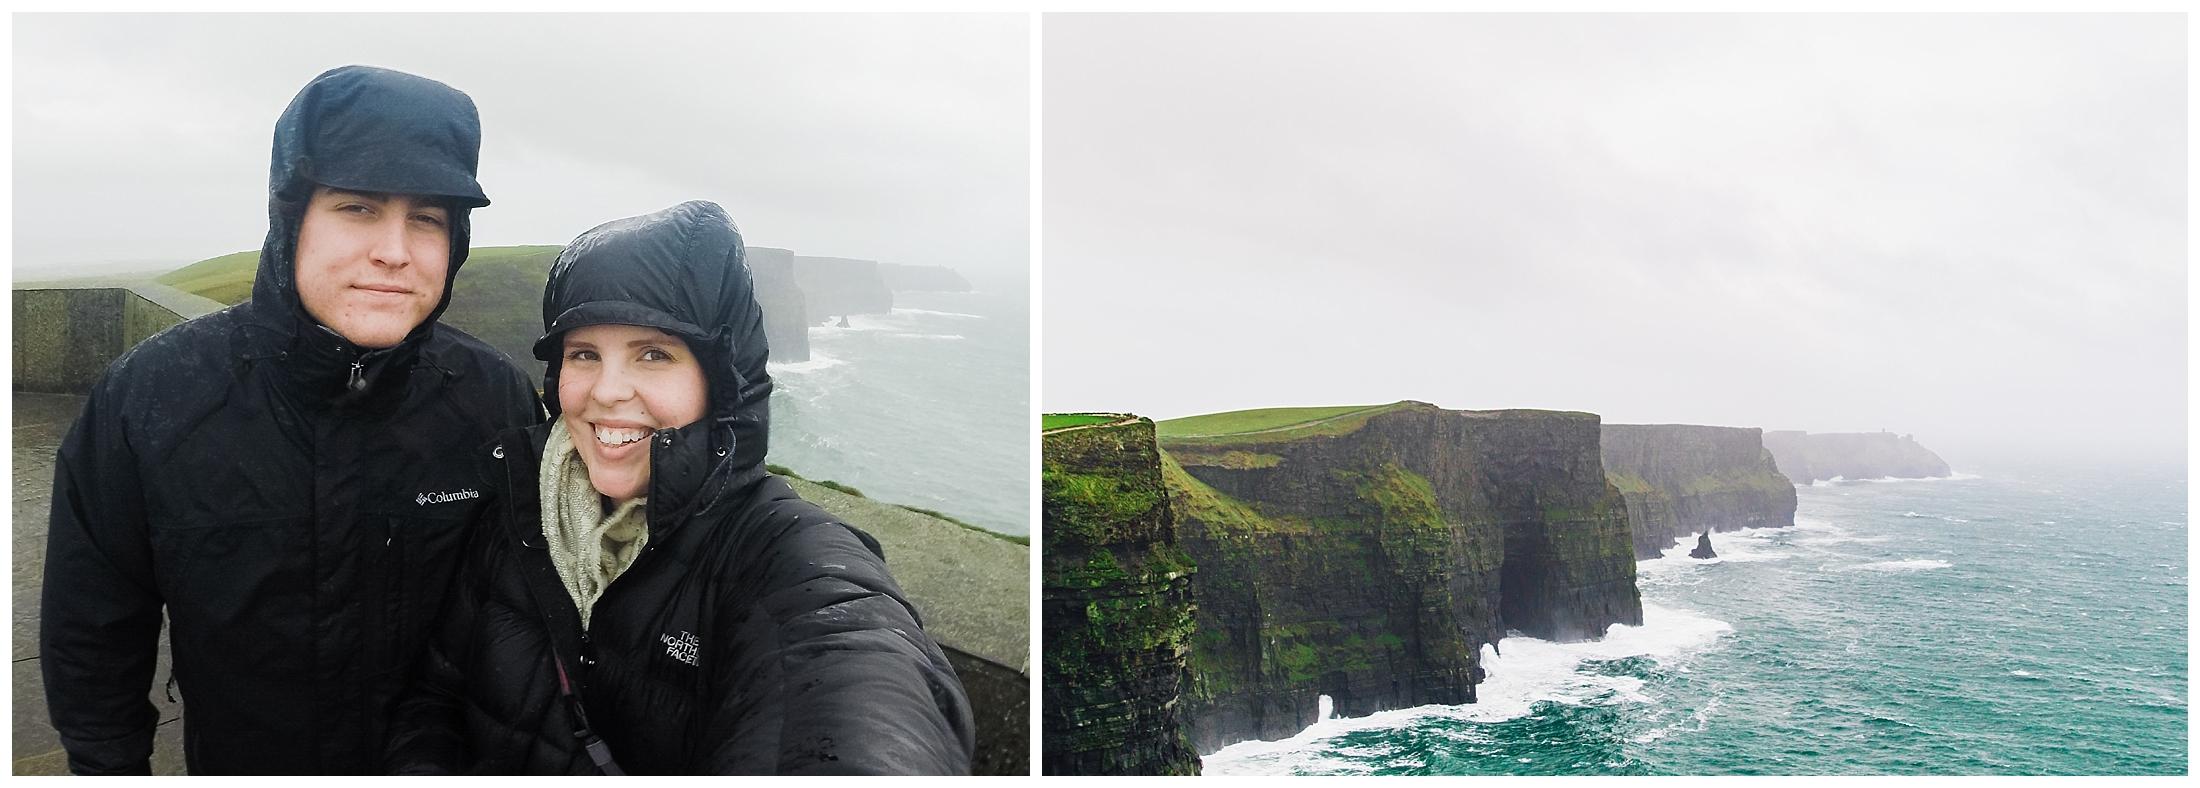 Ireland-10-Day-Itinerary-Trip5.jpg